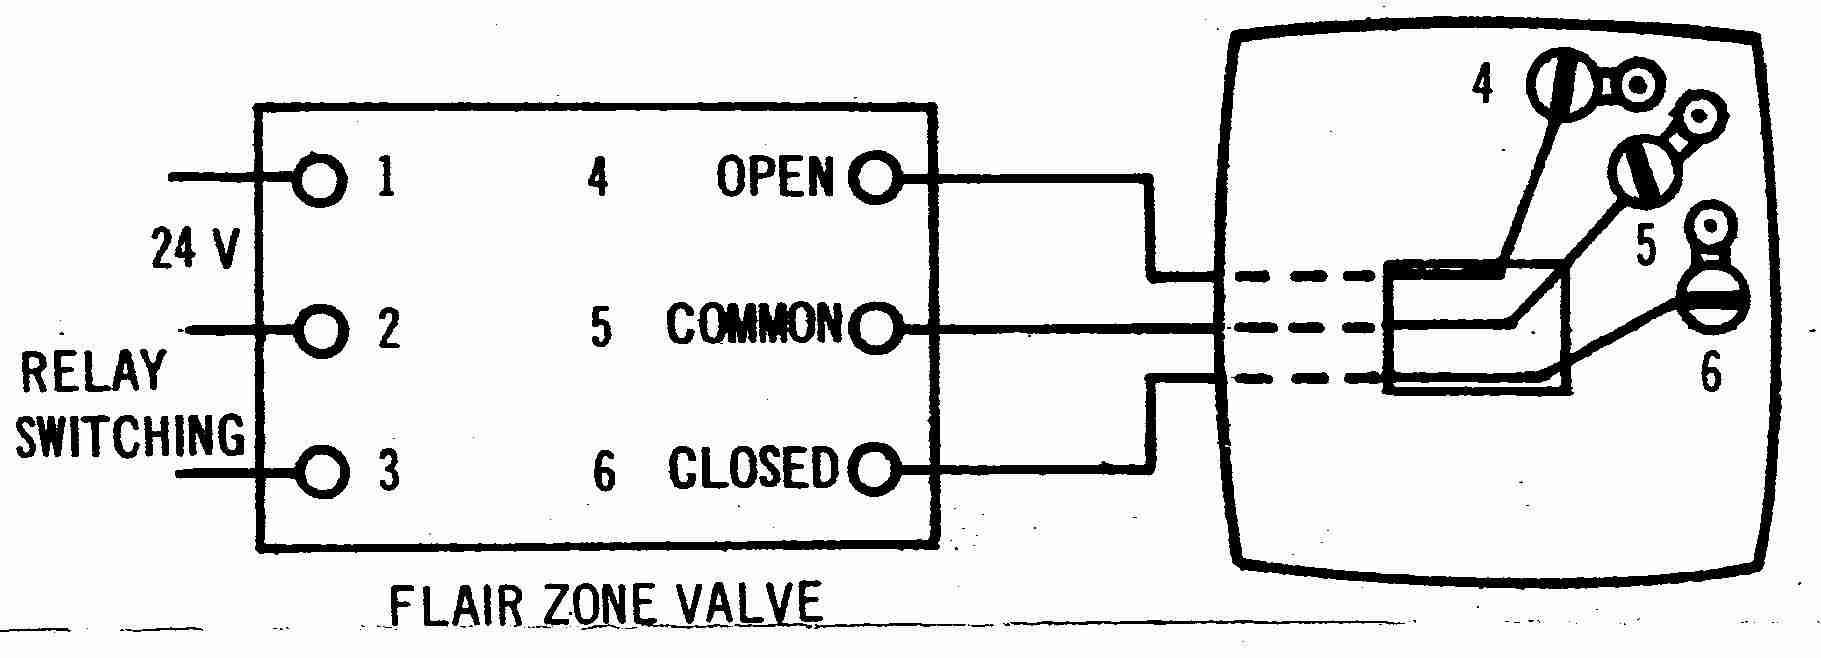 4 Wire Zone Valve Diagram - Wiring Diagrams Hubs - Honeywell Zone Valve Wiring Diagram